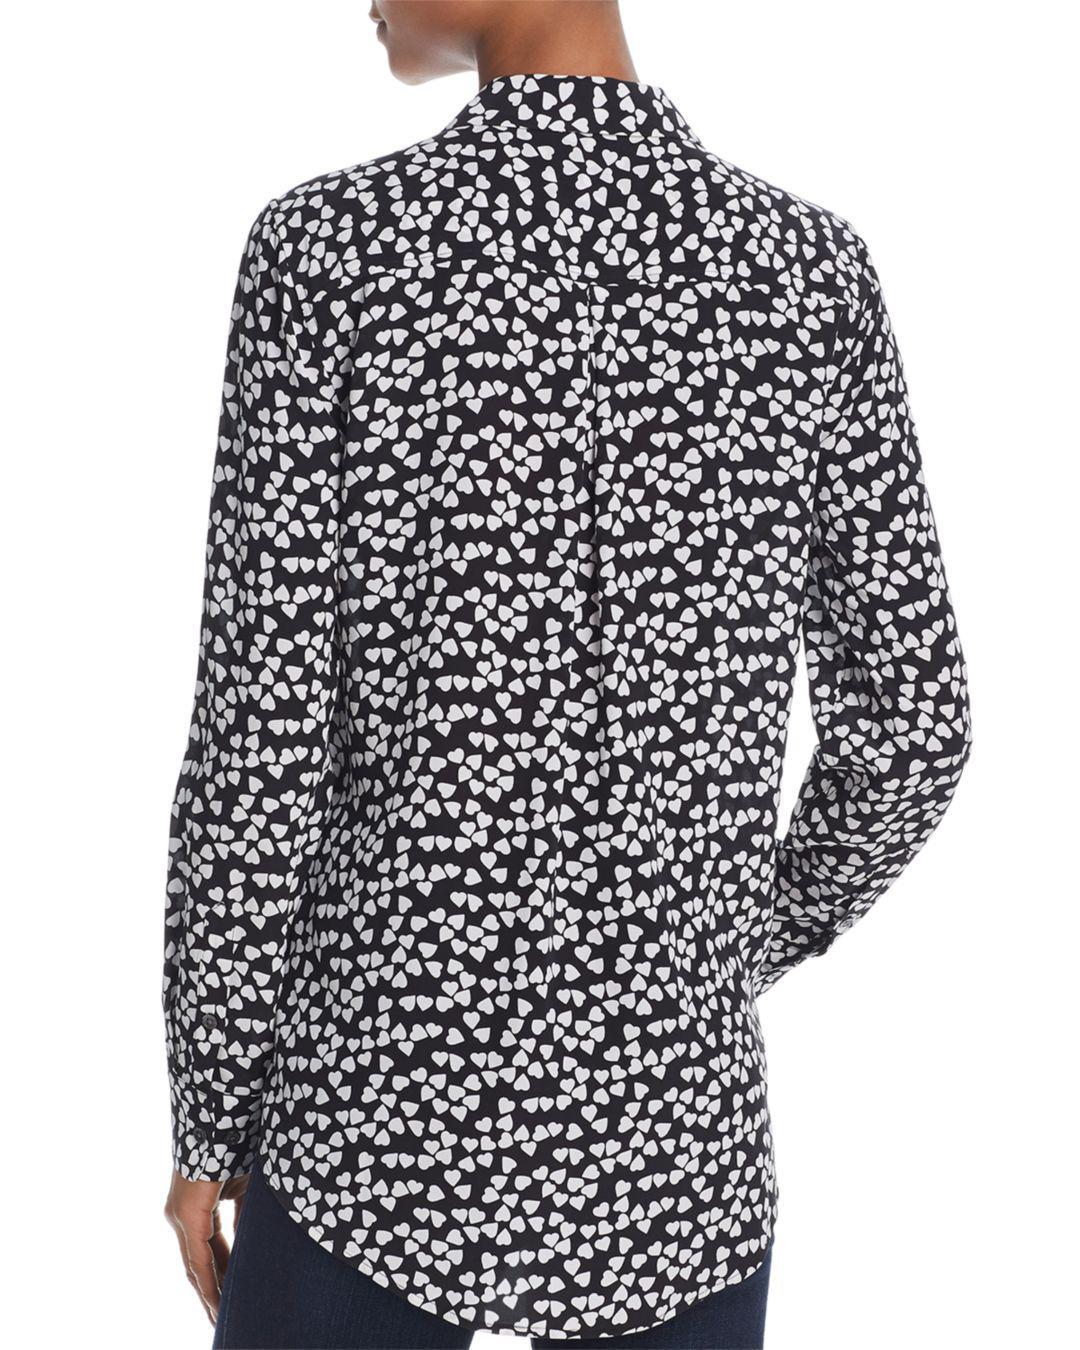 27efd01a4c4595 Lyst - Equipment Essential Silk Heart Shirt in Black